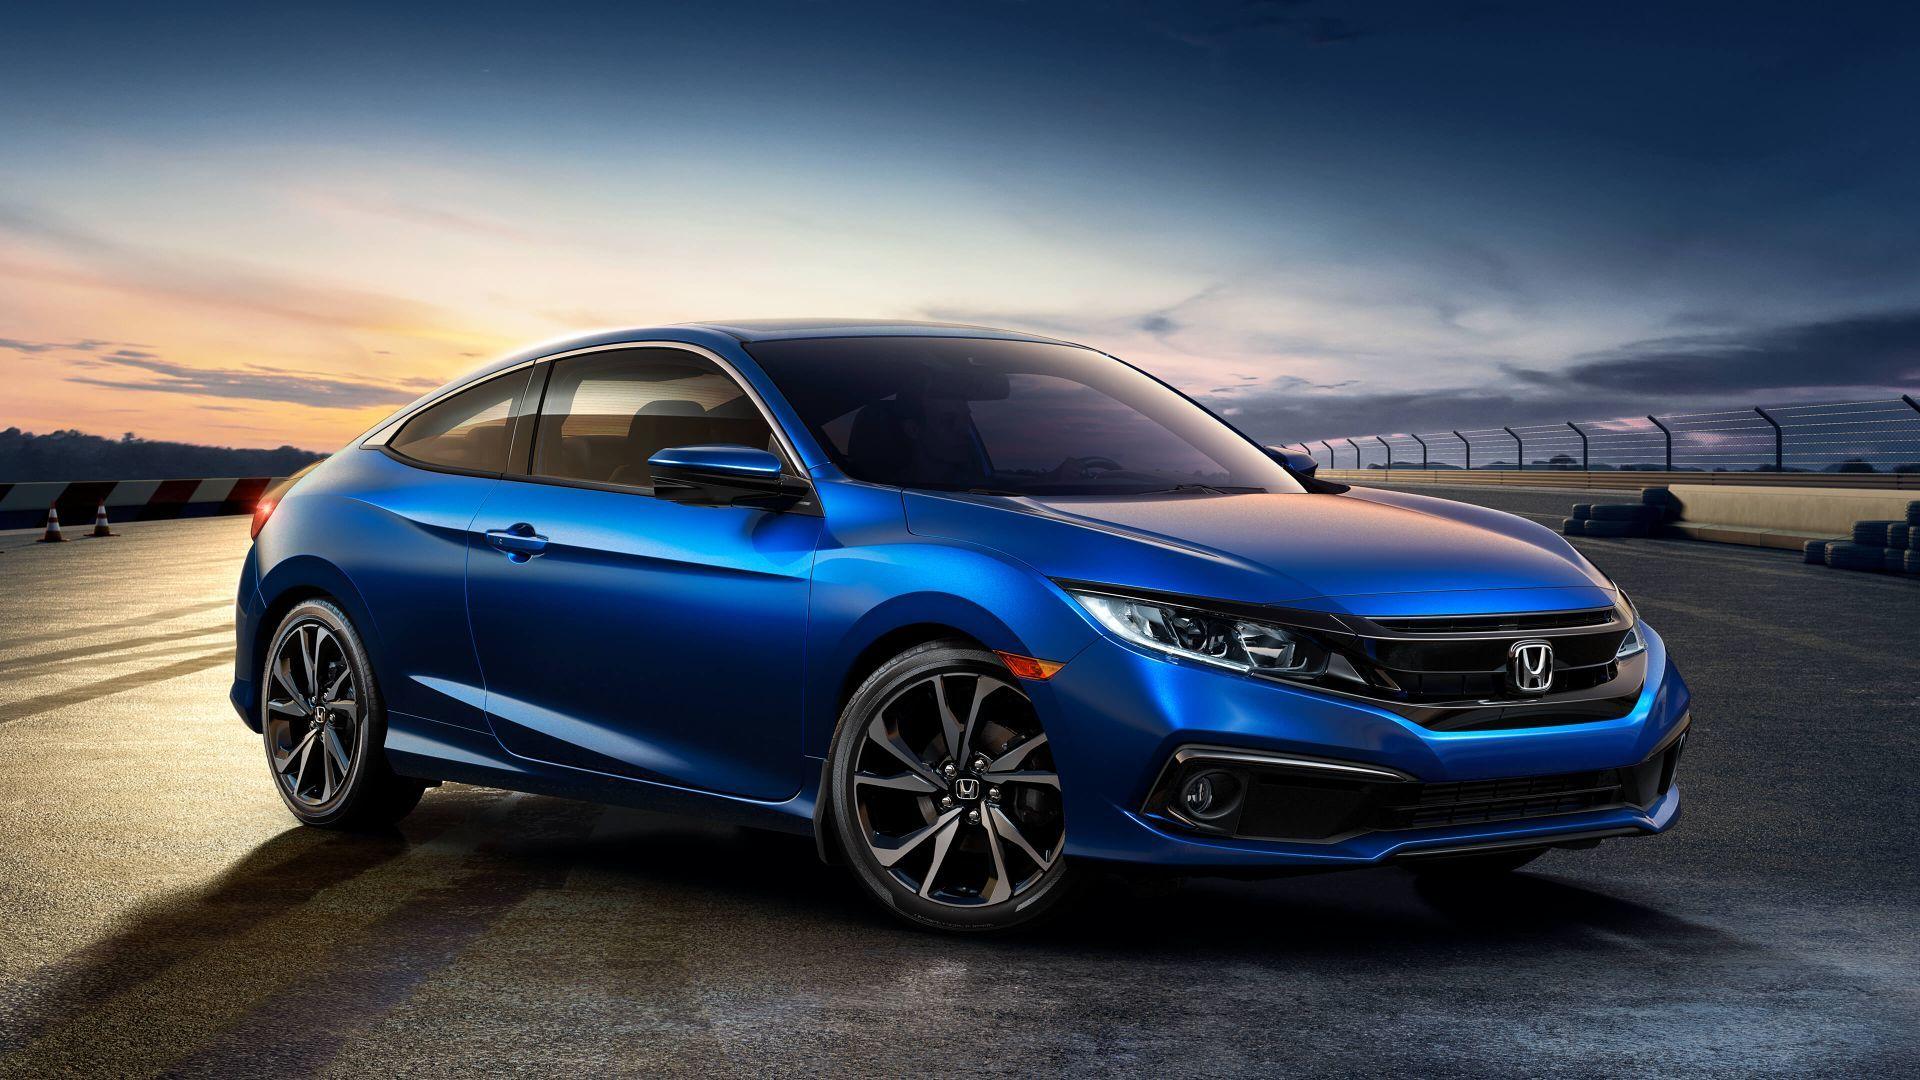 Honda De Terrebonne >> The New 2019 Honda Civic Coupe In Laval Honda De Laval